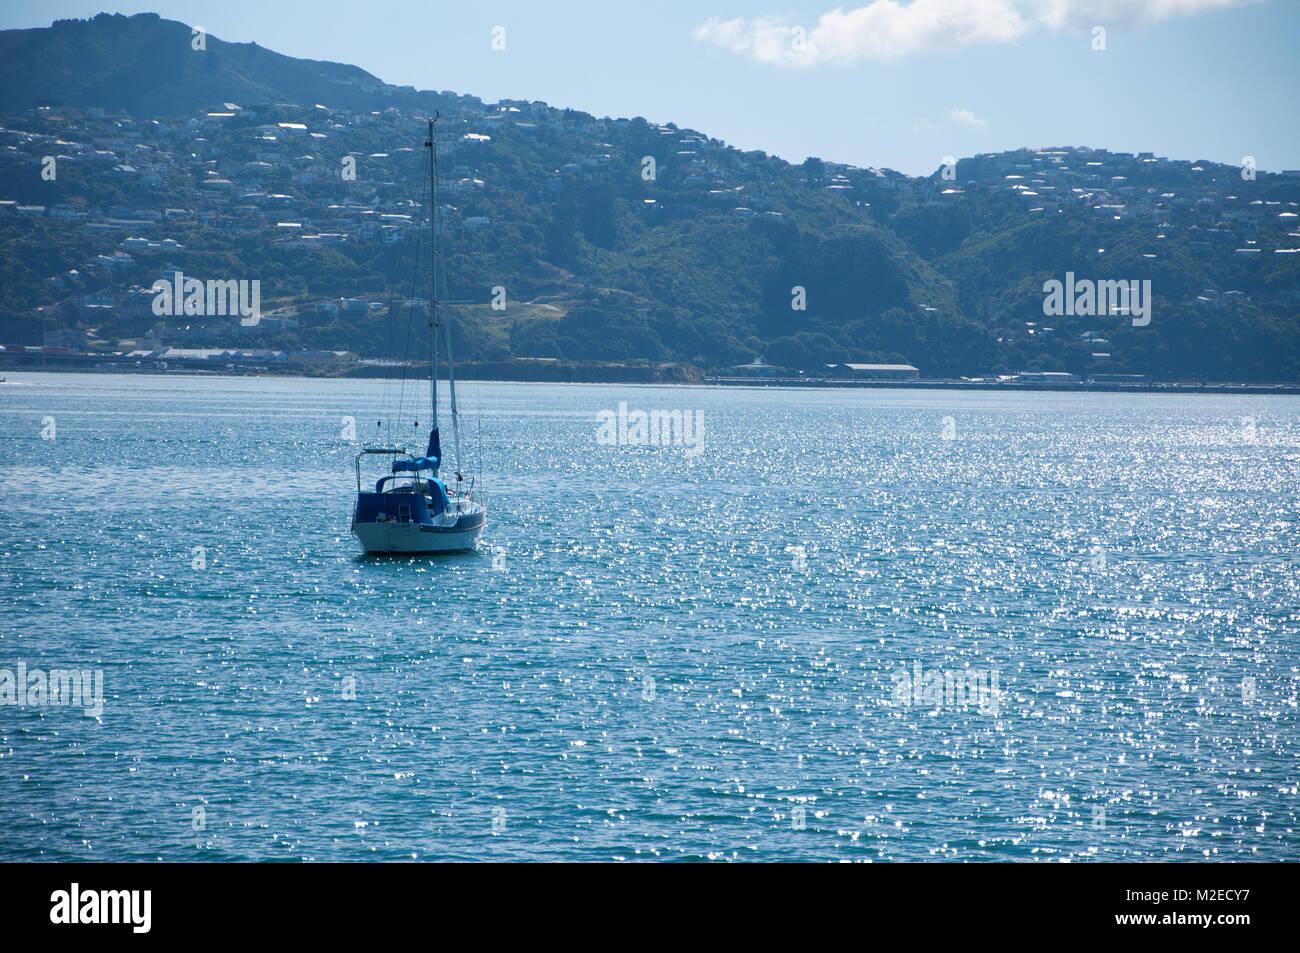 Yacht On Wellington Harbour - Stock Image